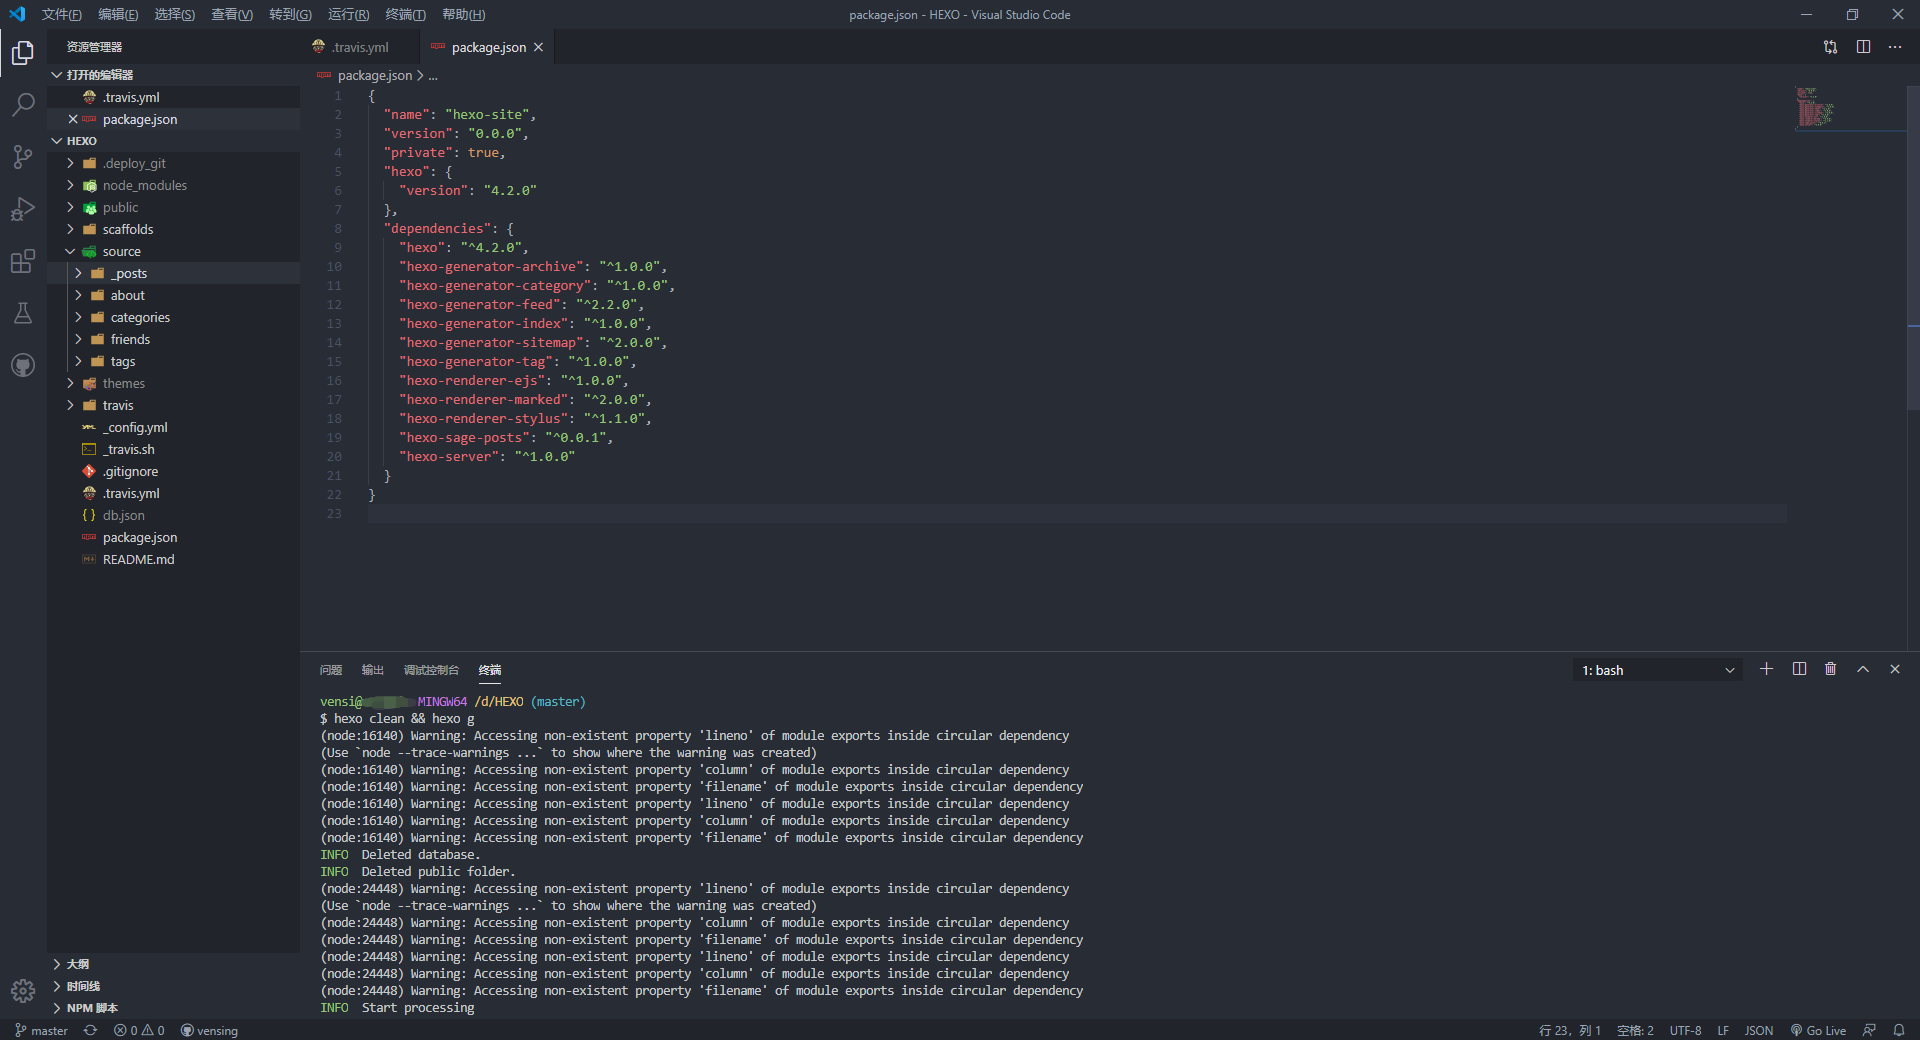 v14.0.0 构建空 html 的 bug